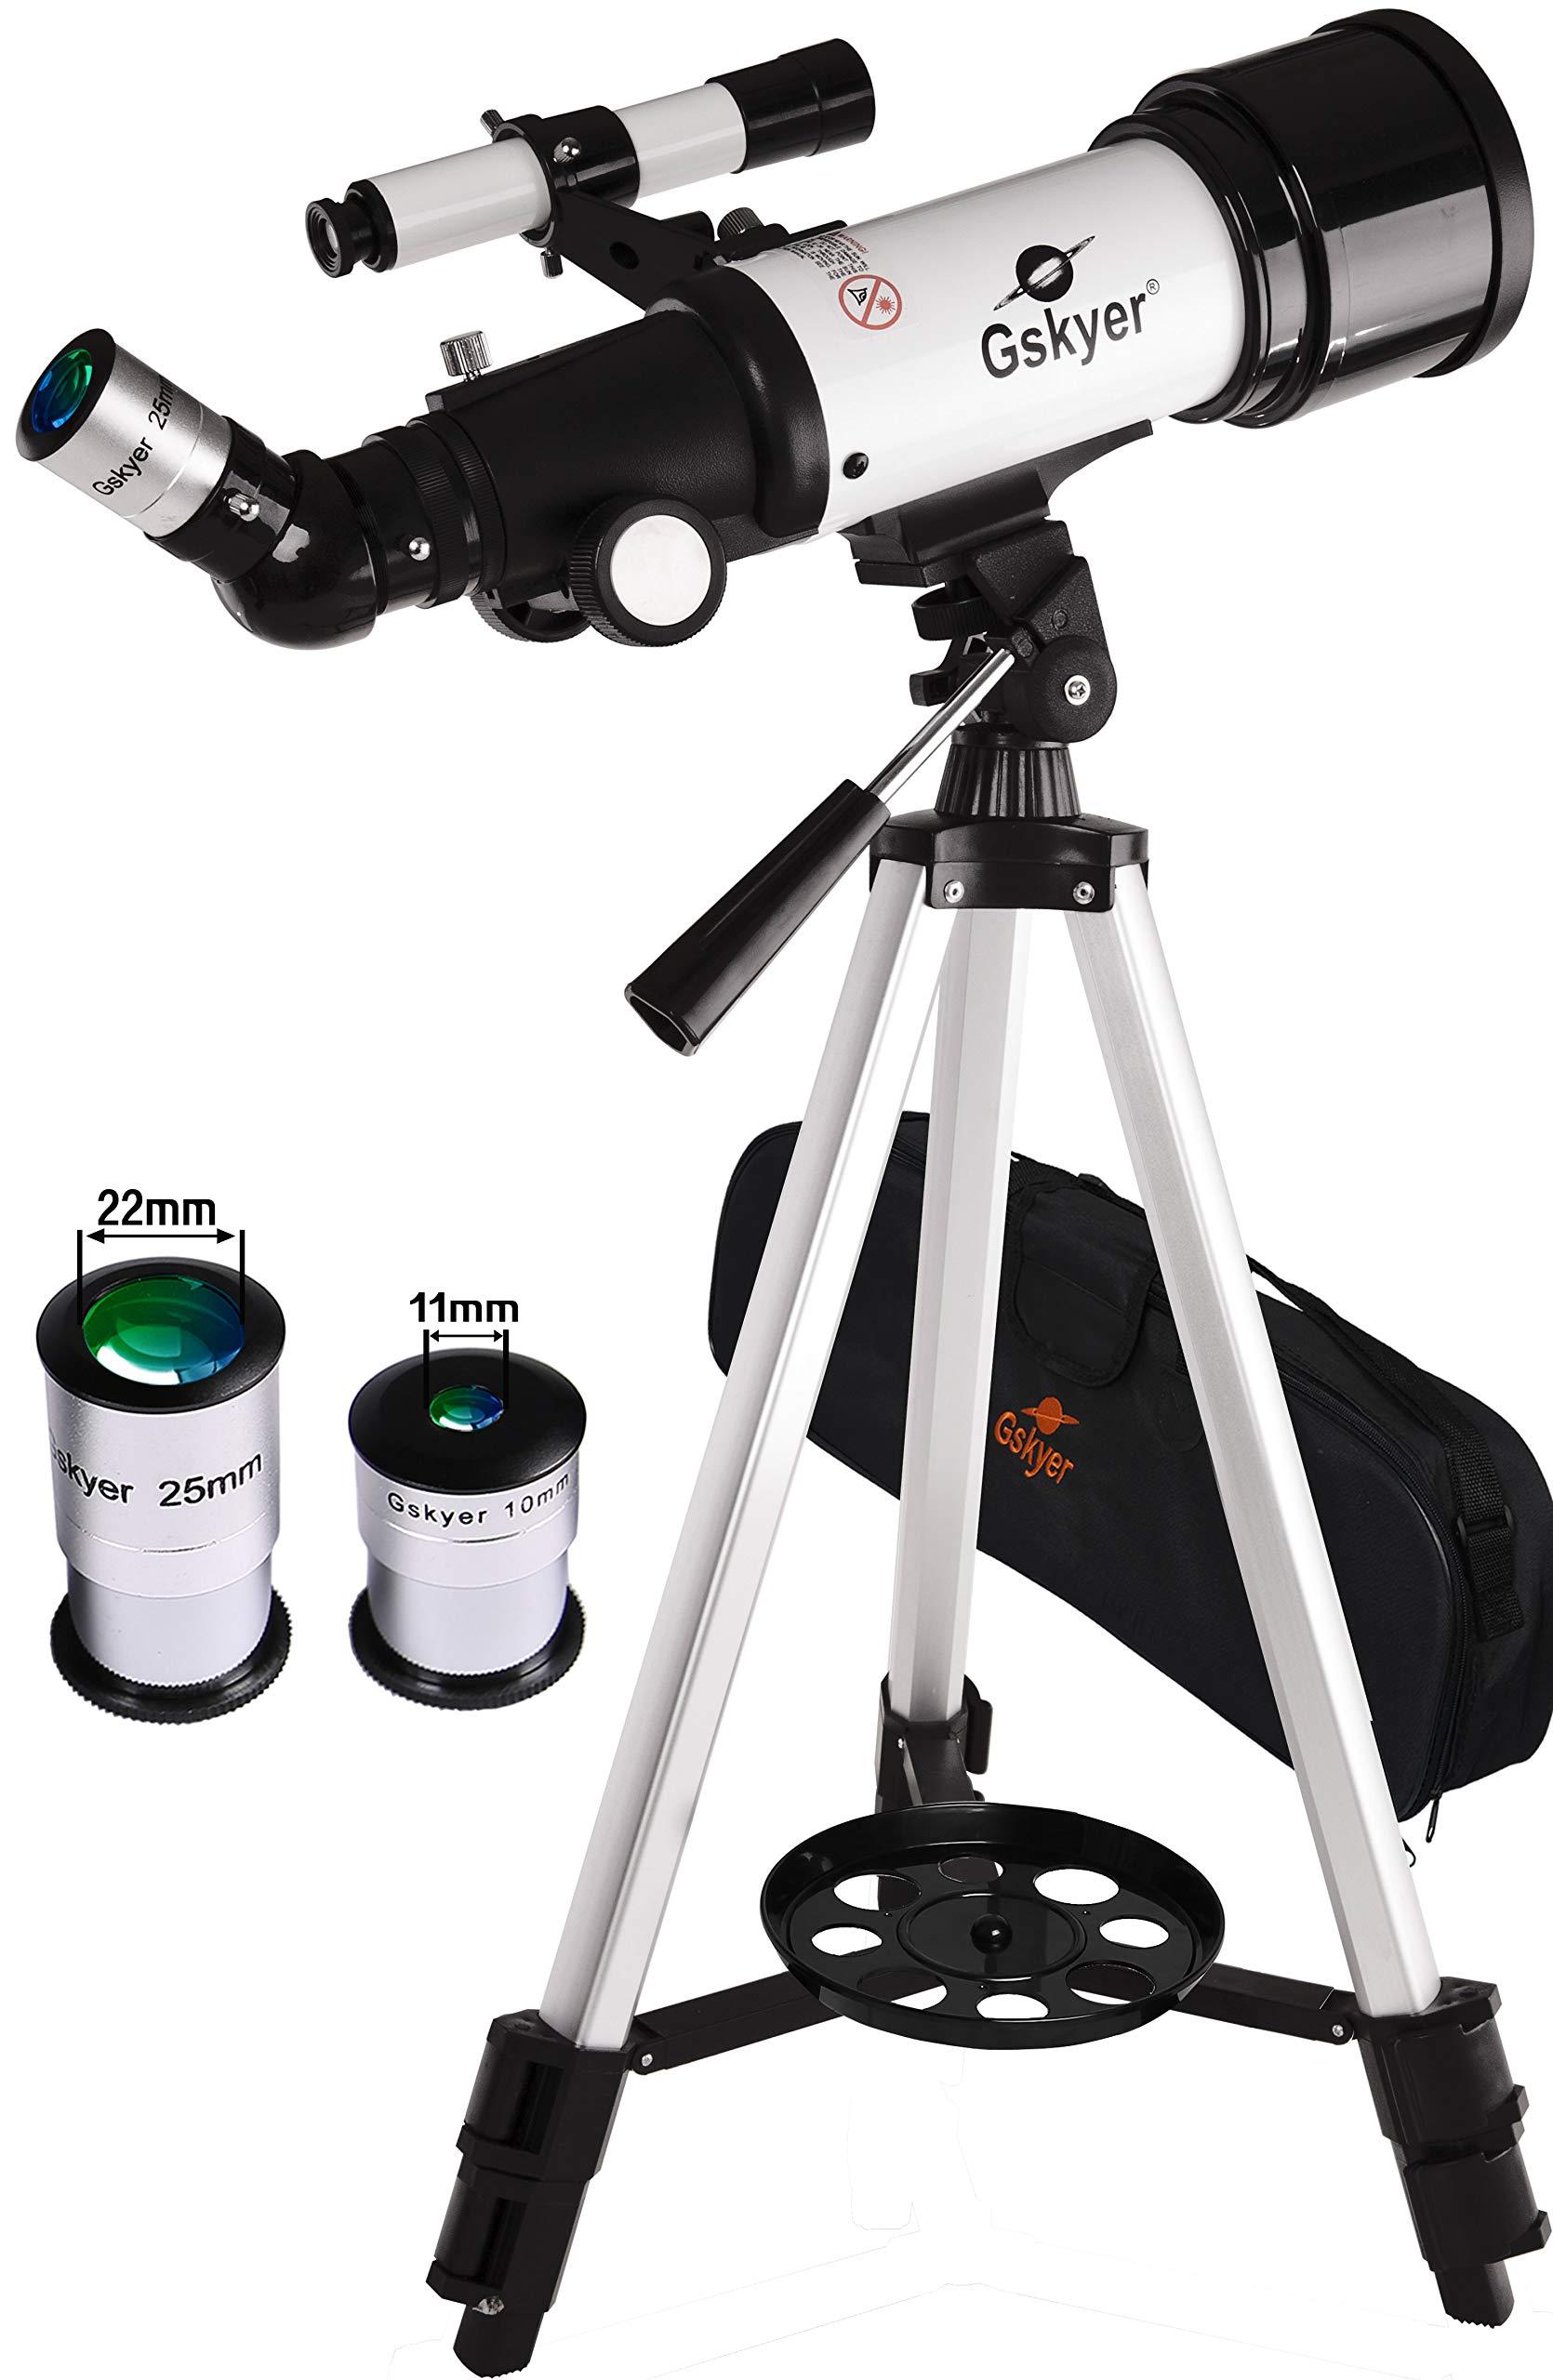 Gskyer Telescope, AZ70400 German Technology Astronomy Telescope,  Travel Refractor by Gskyer